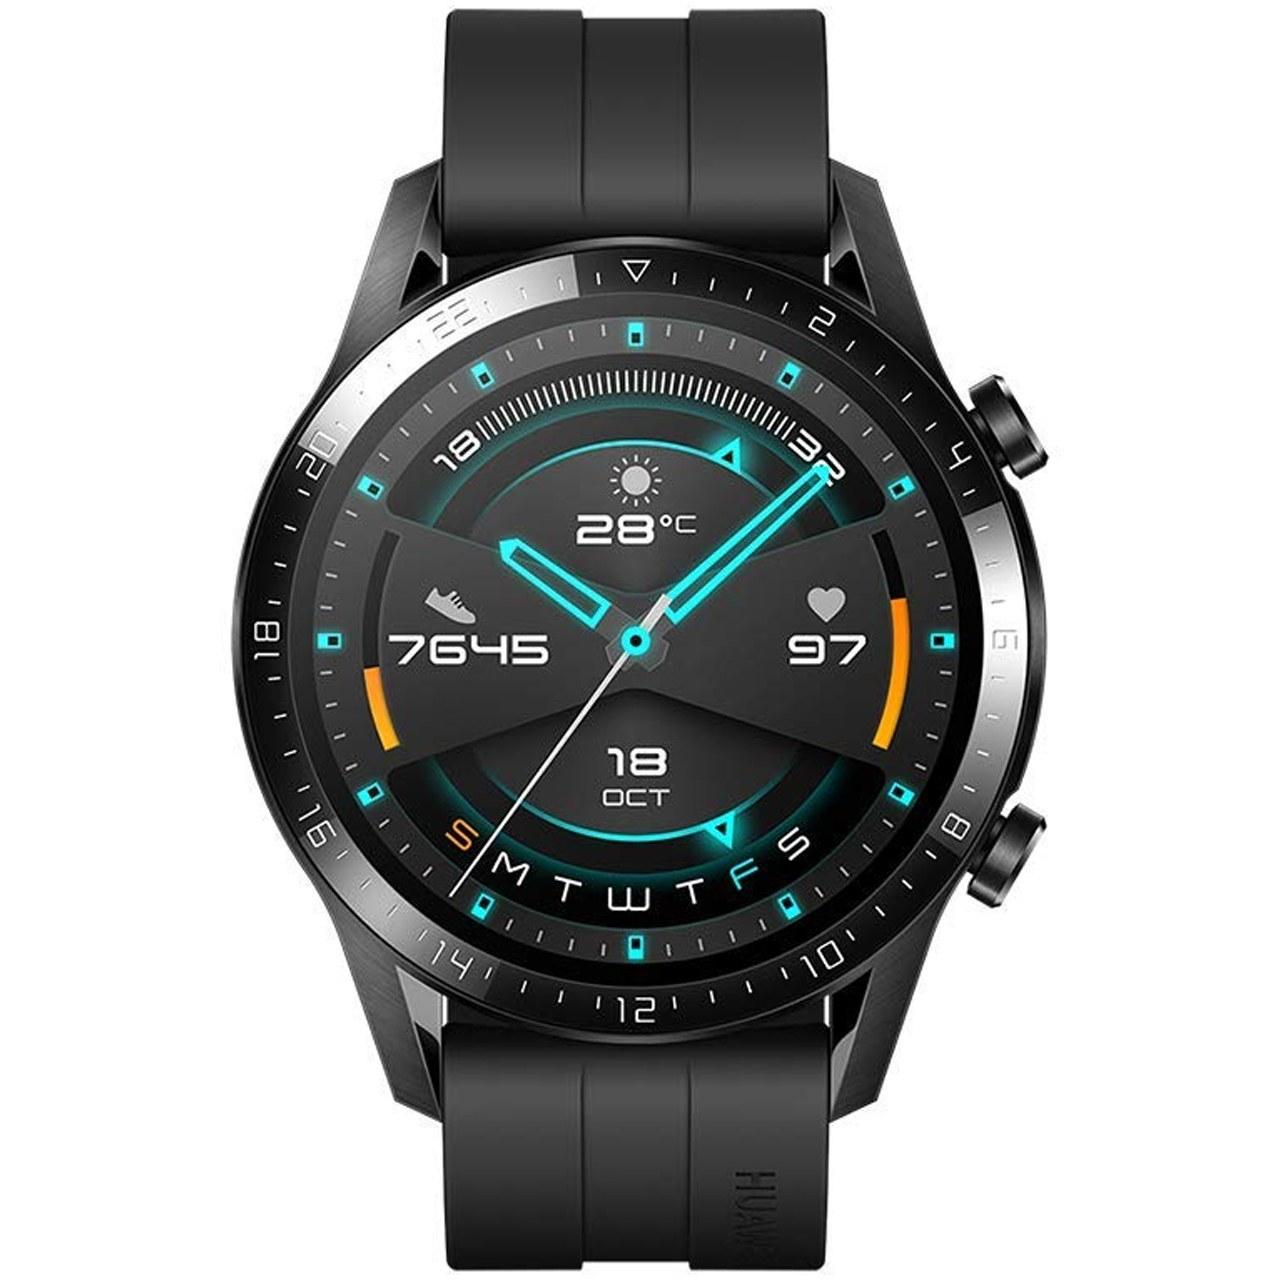 ساعت هوشمند هوآوی مدل Watch GT 2 LTN-B19 46mm با گارانتی مدیاپردازش